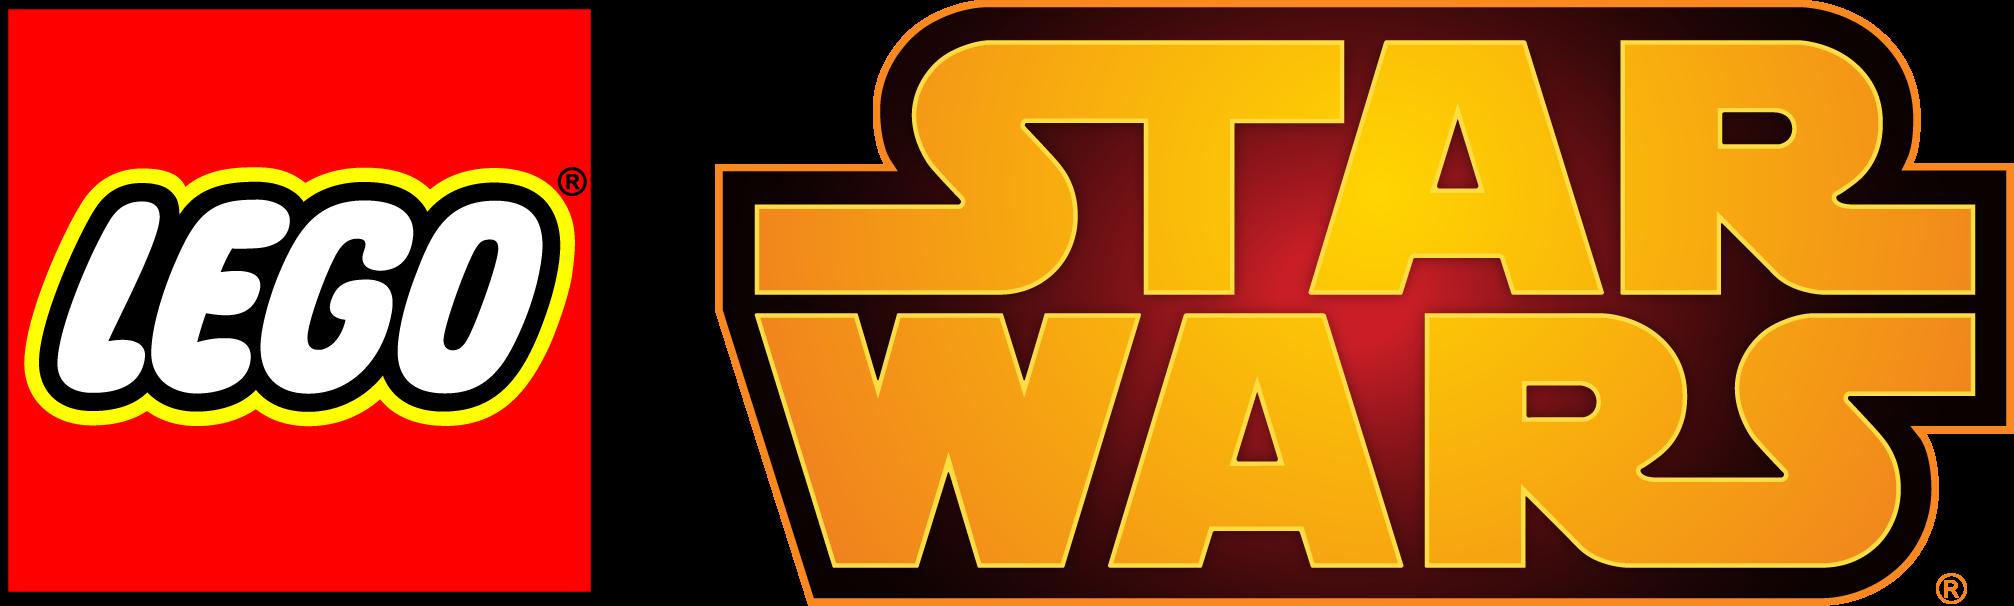 Legos clipart set. Lego star wars free